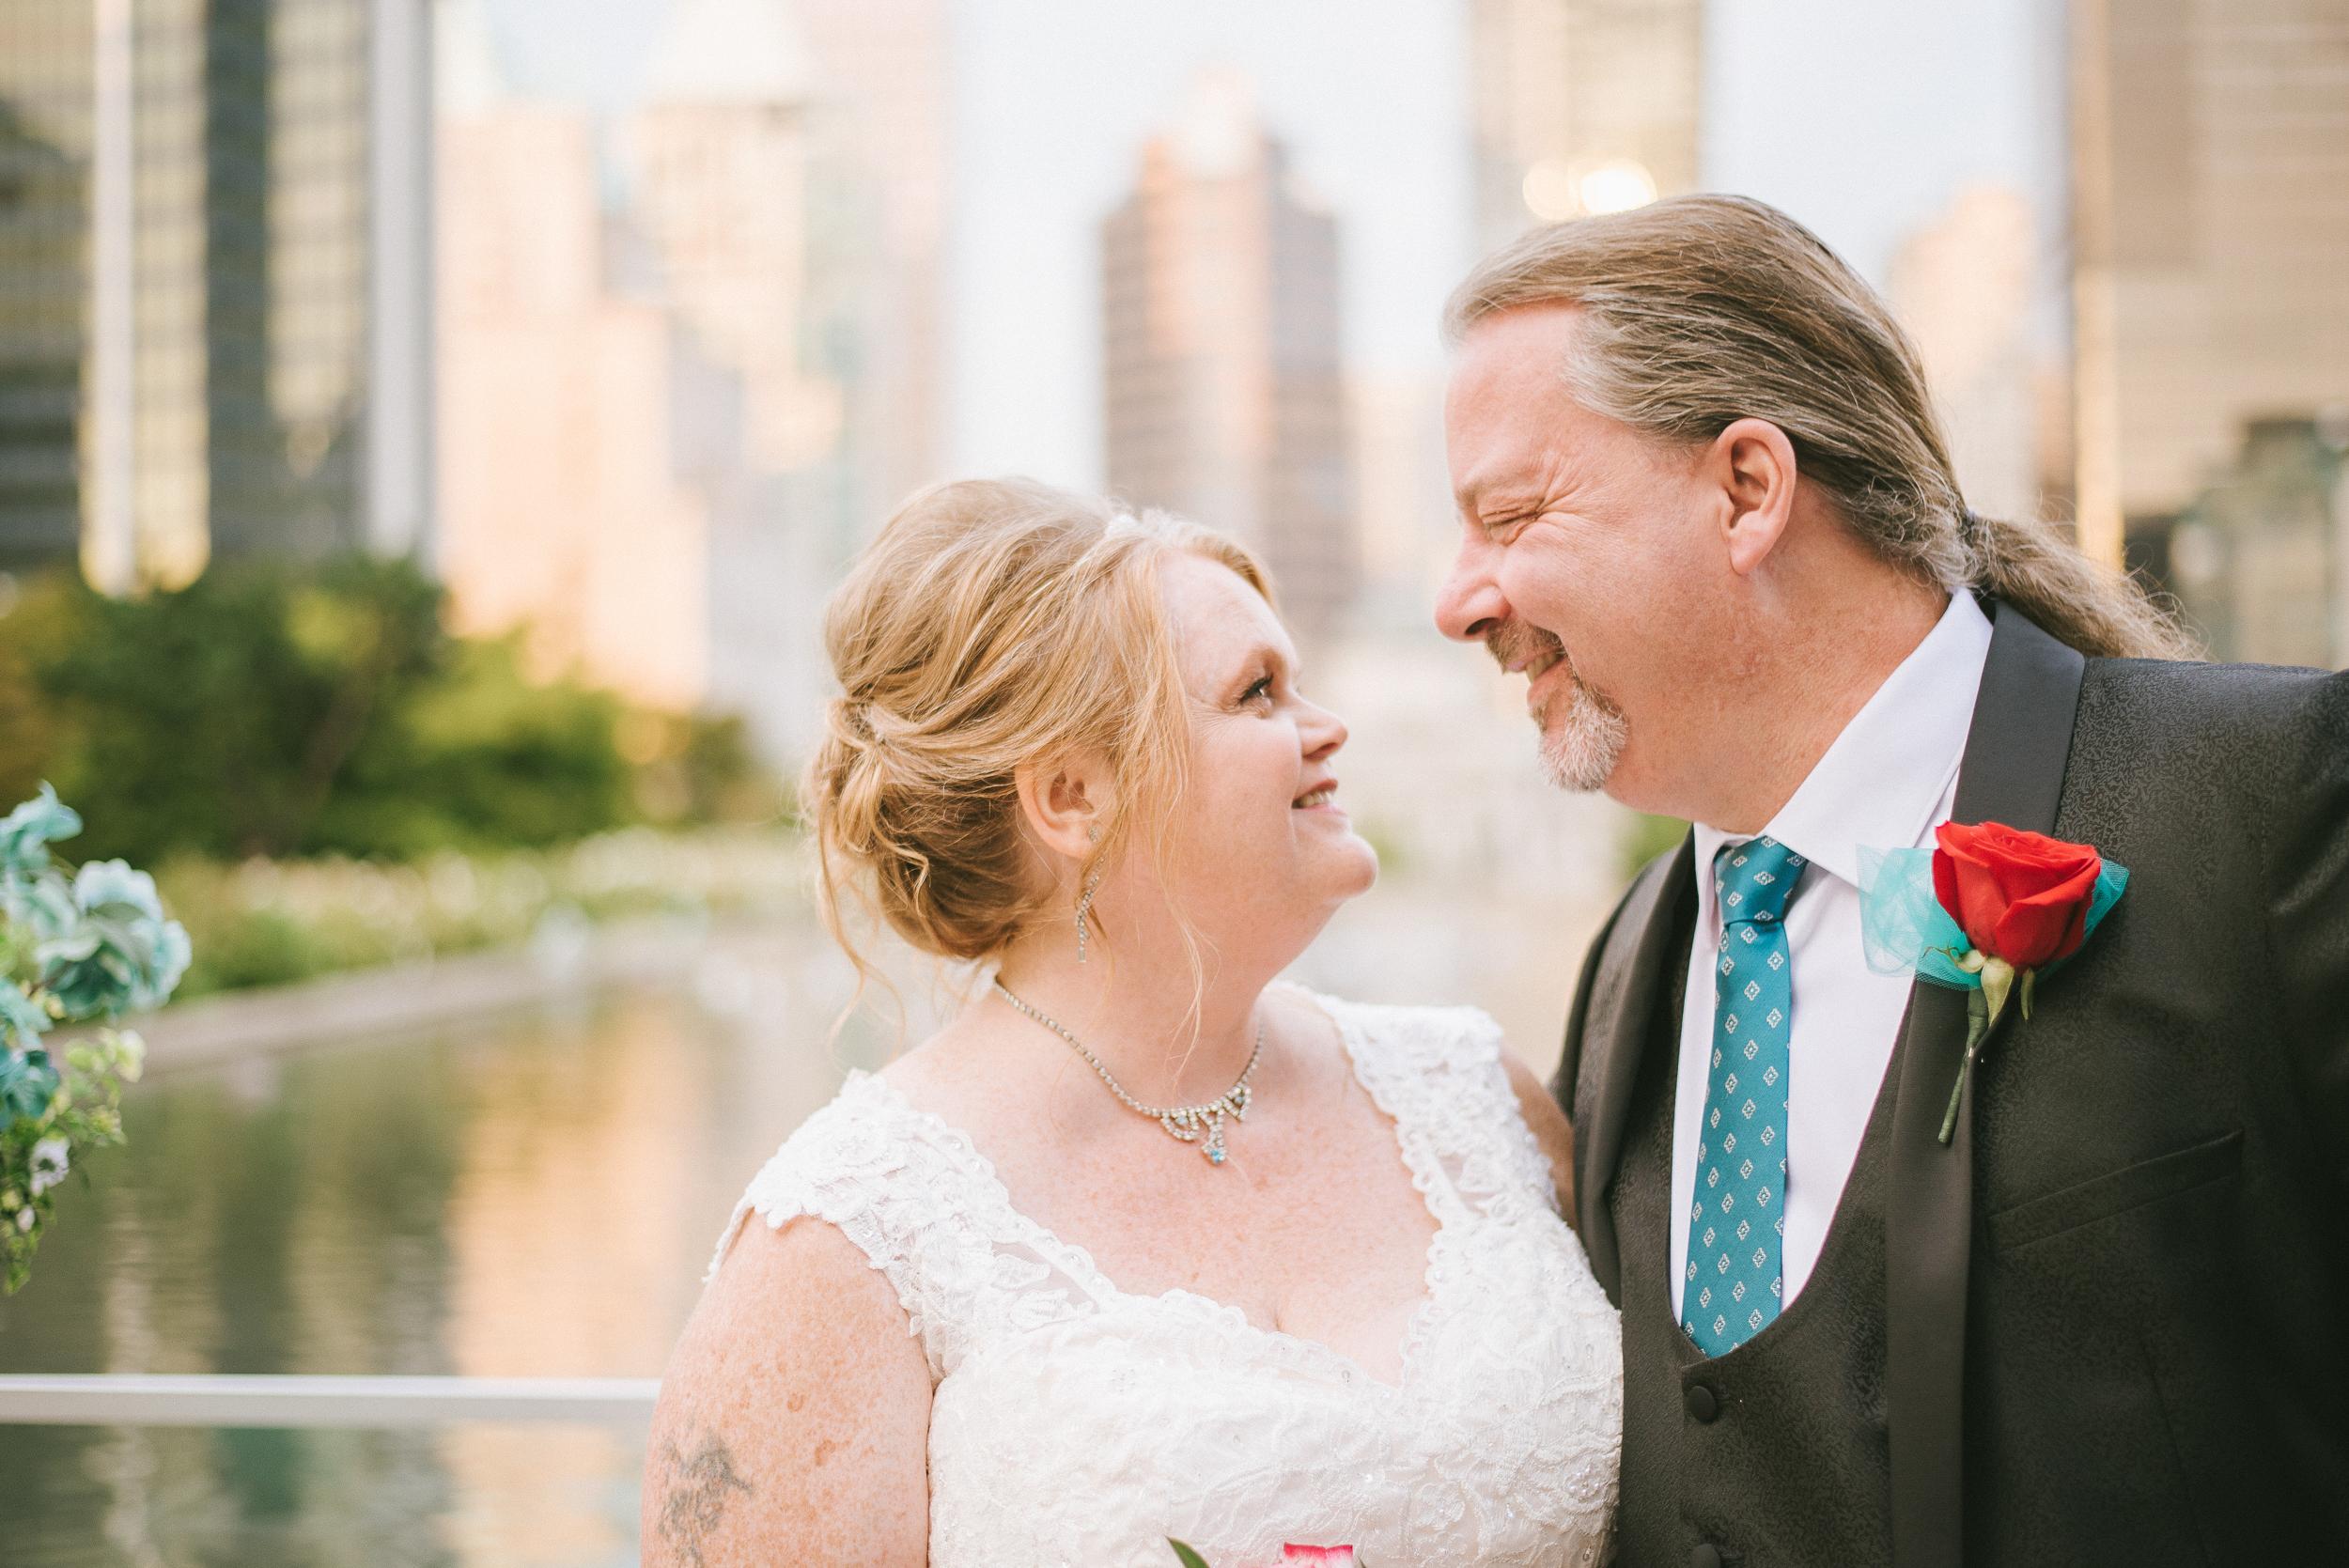 Francine + Pat   Sunset Law Court Inn Wedding Photographer   Susan Sun Photography   Downtown Vancouver, BC-57.jpg